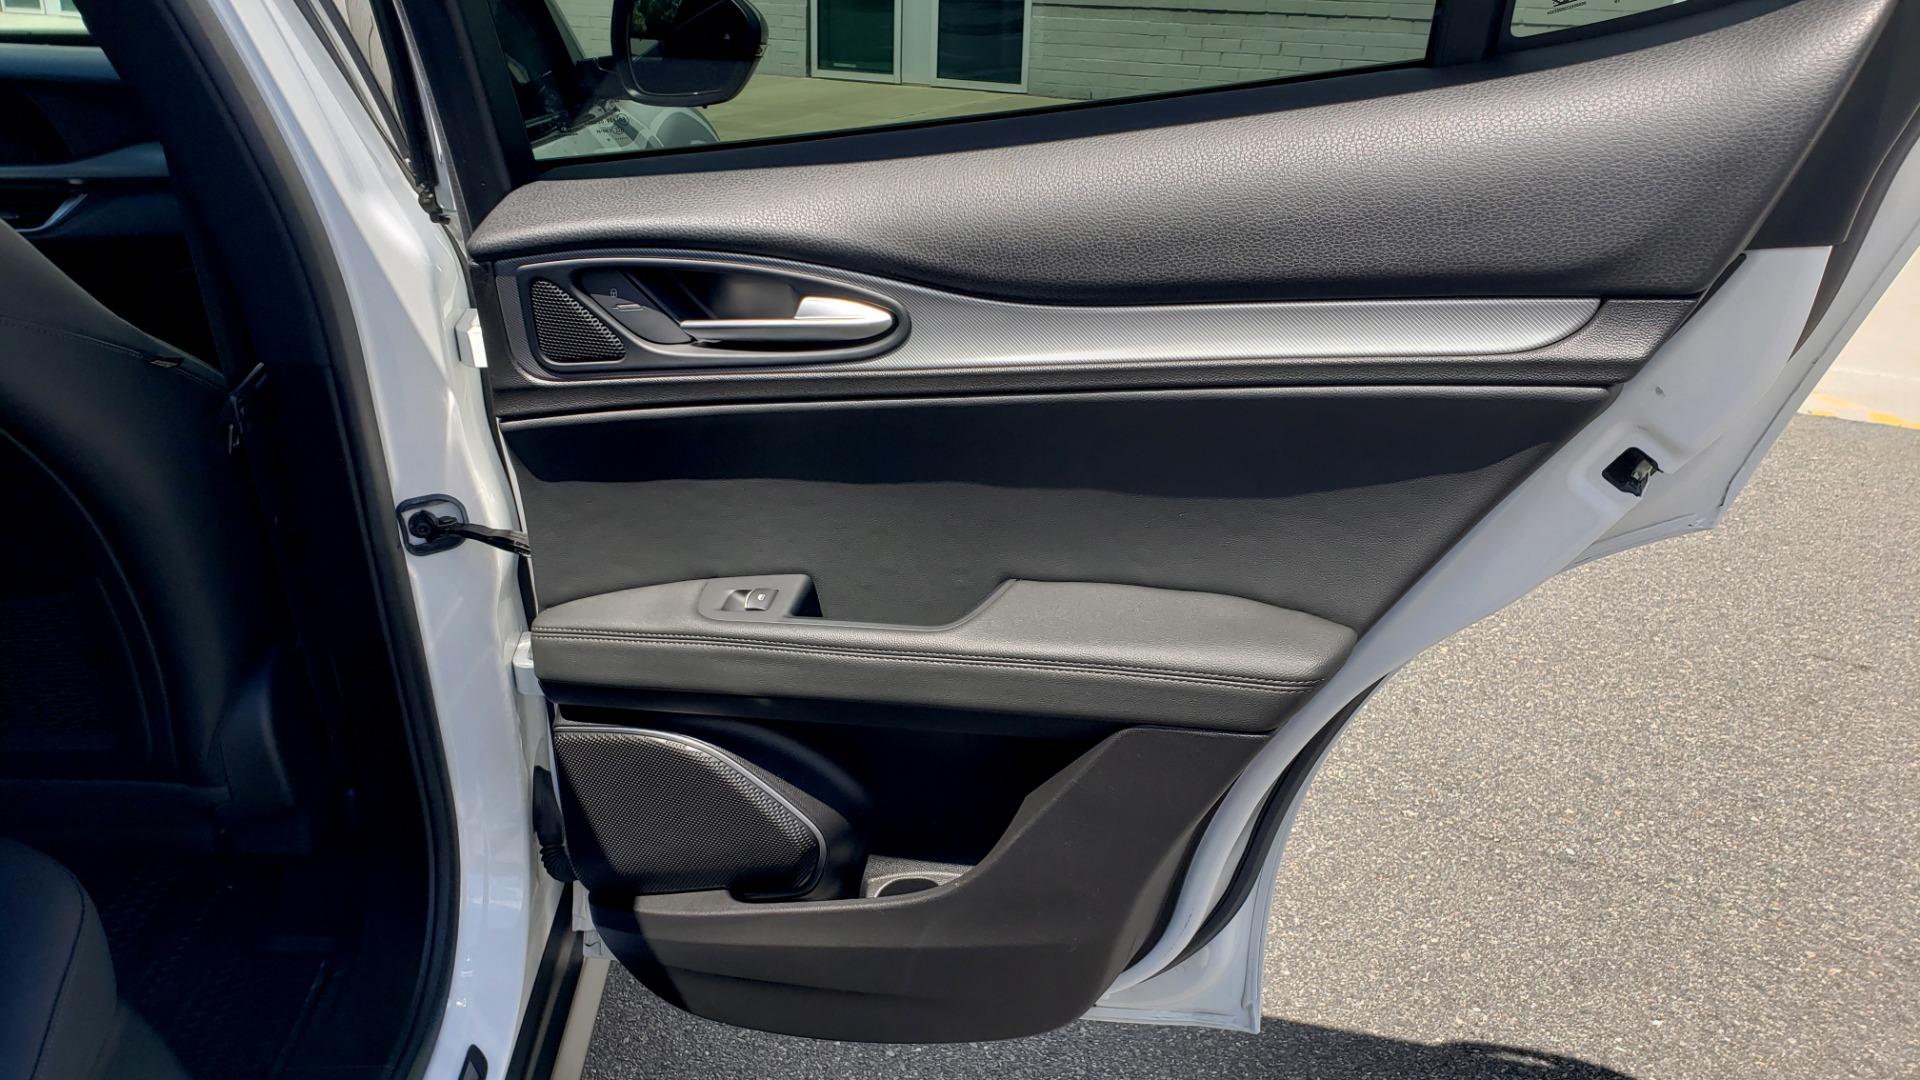 Used 2019 Alfa Romeo STELVIO TI SPORT AWD / 2.0L TURBO / 8-SPD AUTO / DRVR ASST / REARVIEW for sale $37,495 at Formula Imports in Charlotte NC 28227 74